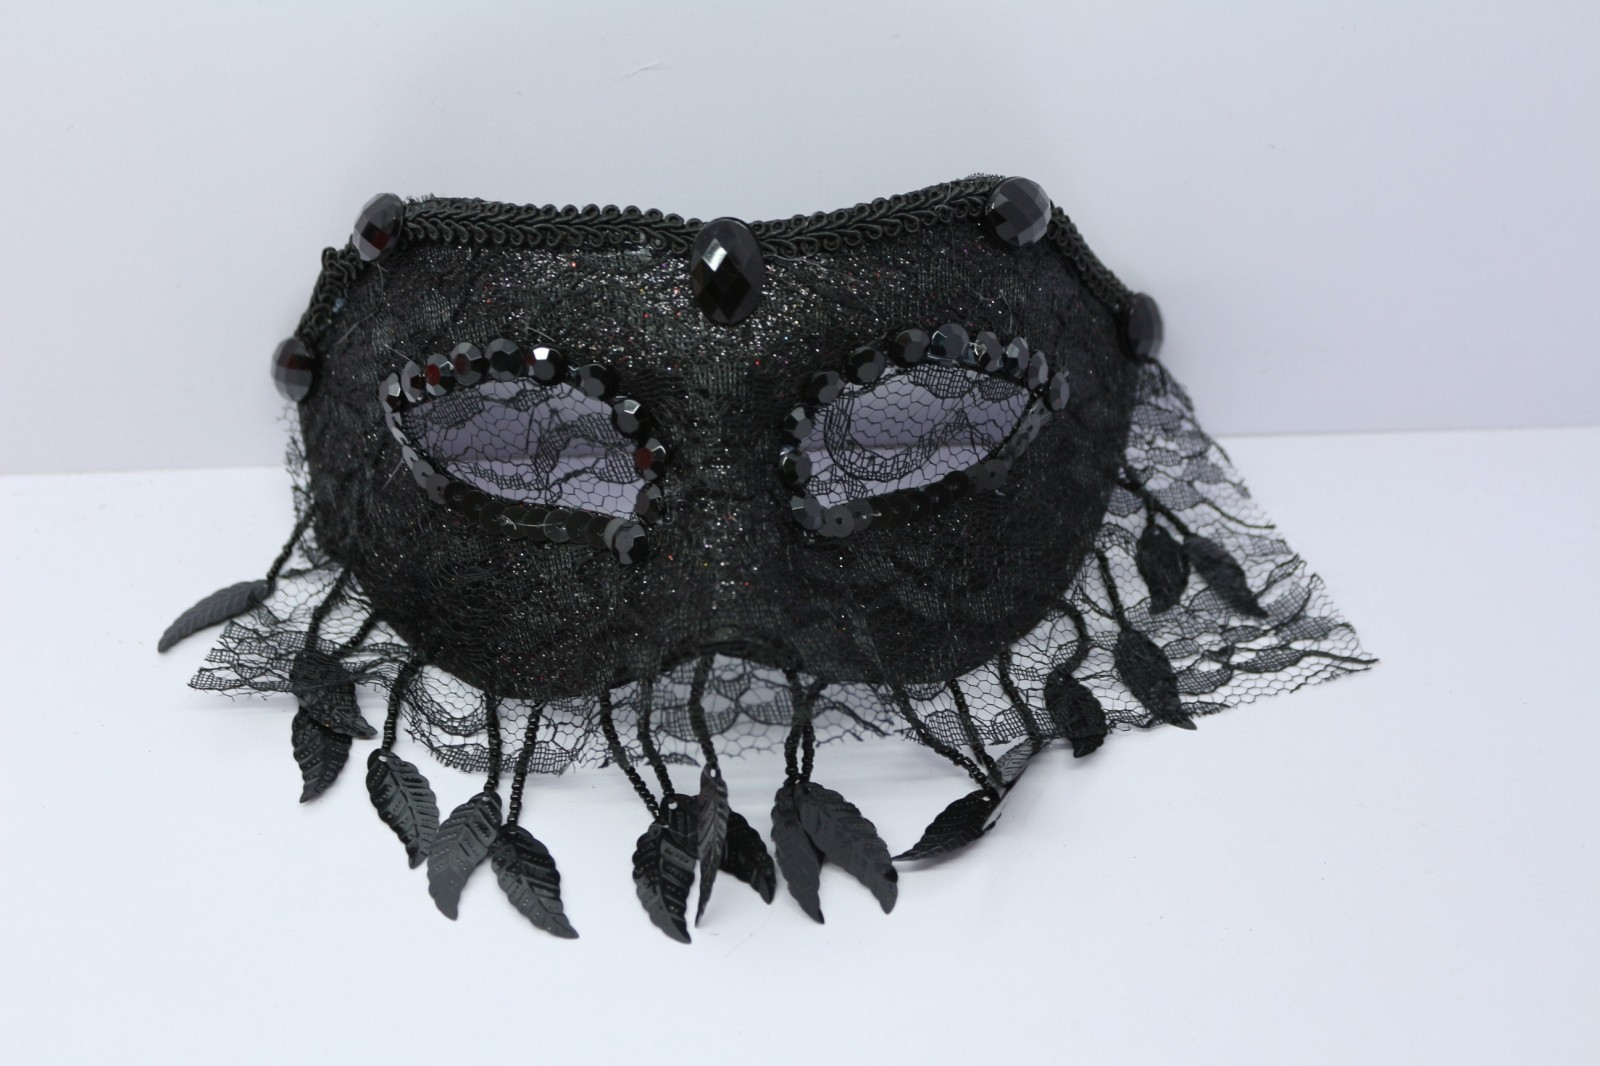 Venetian Goddess Masquerade Mask with High Fashion Macrame Lace & Diamonds mk33 - $22.00